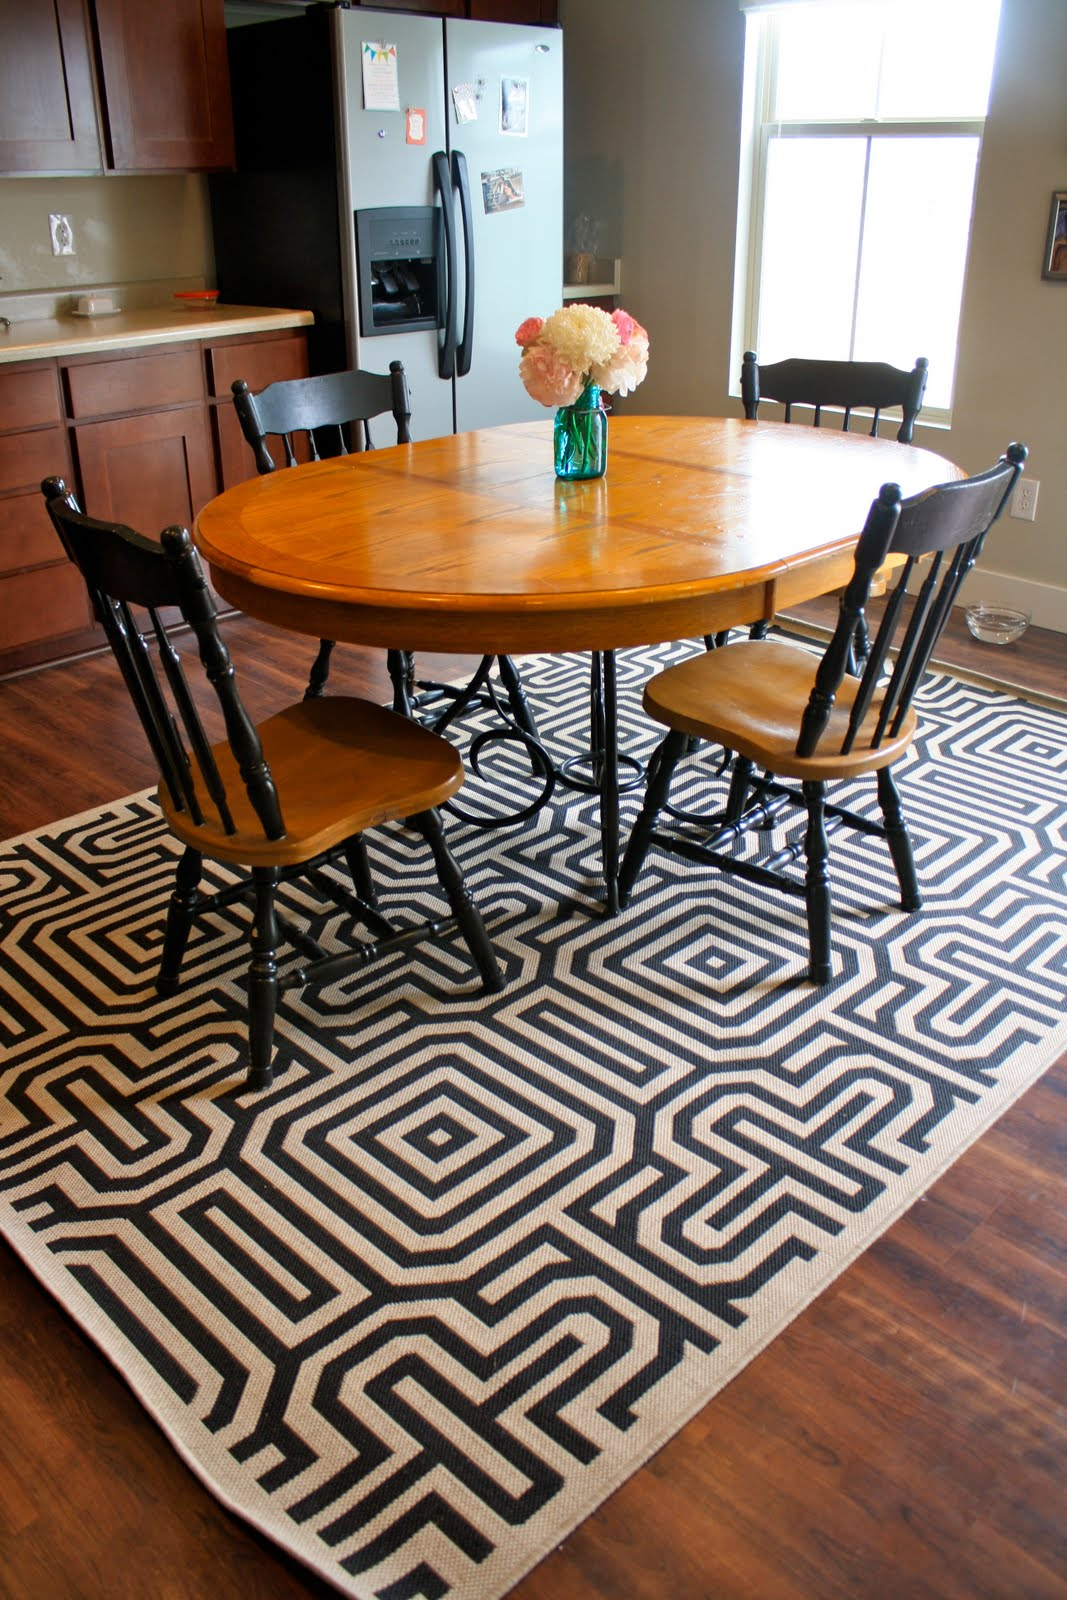 new kitchen rug eat in kitchen table New Kitchen Rug